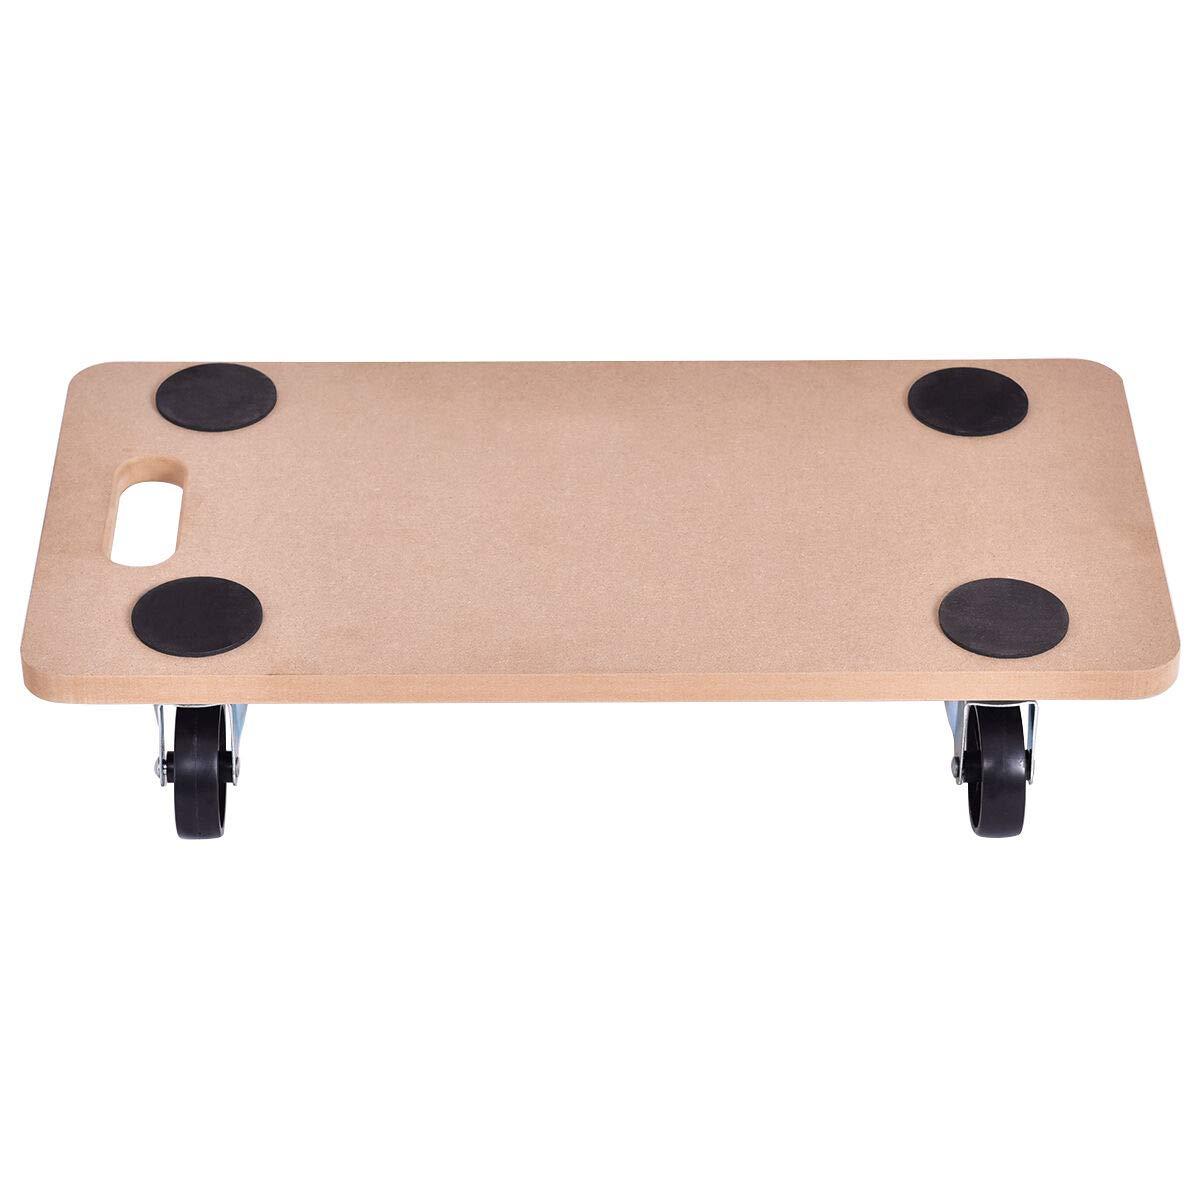 Seleq MDF Platform Dolly - 440 lbs Capacity